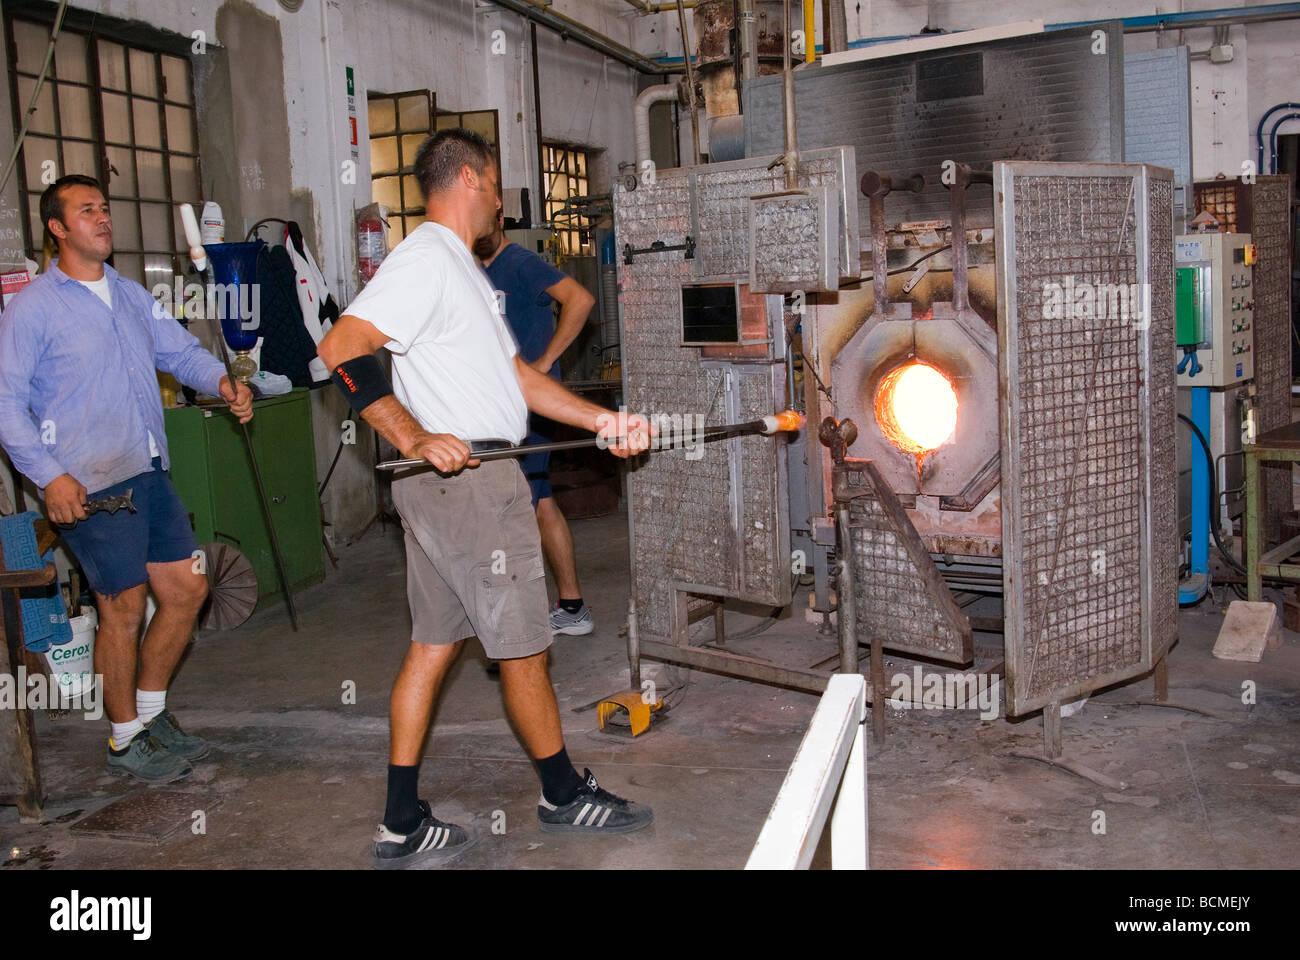 Souffleur De Verre Ile De Ré italy veneto murano glass blower putsglass in the furnace